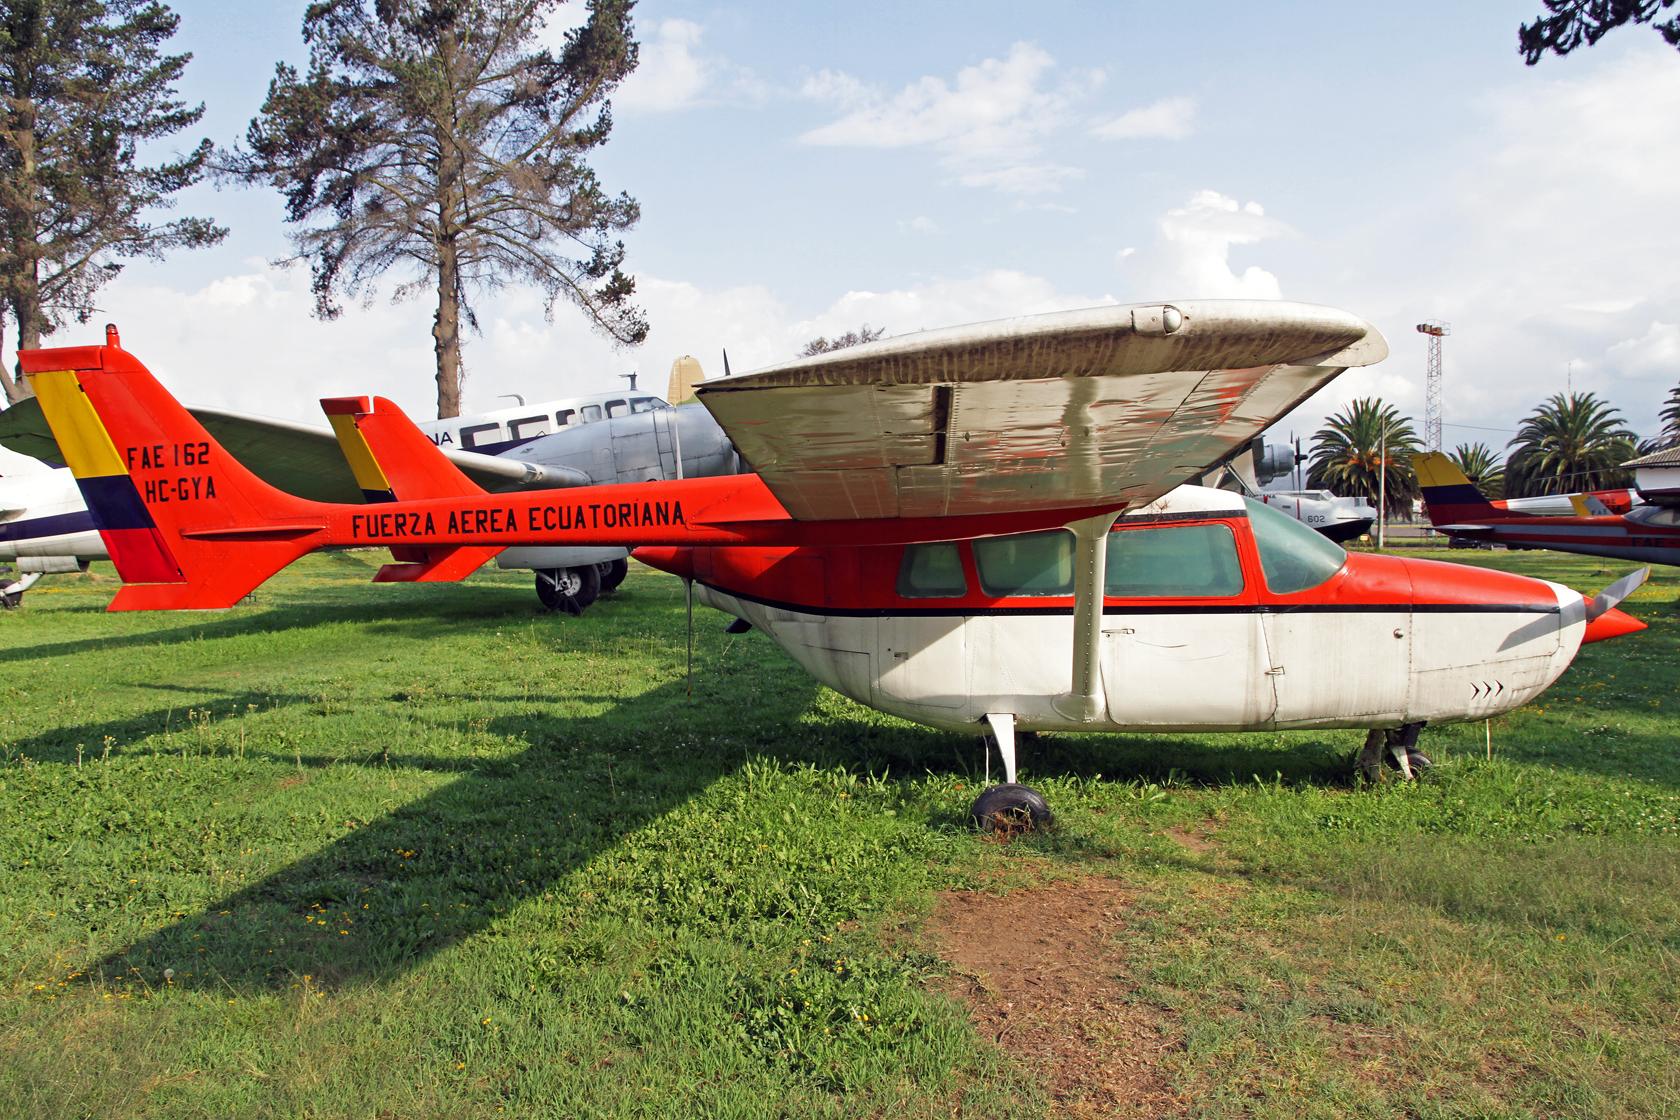 Fuerza Aérea Ecuatoriana Cessna 337 Super Skymaster FAE-162 (HC-GYA)